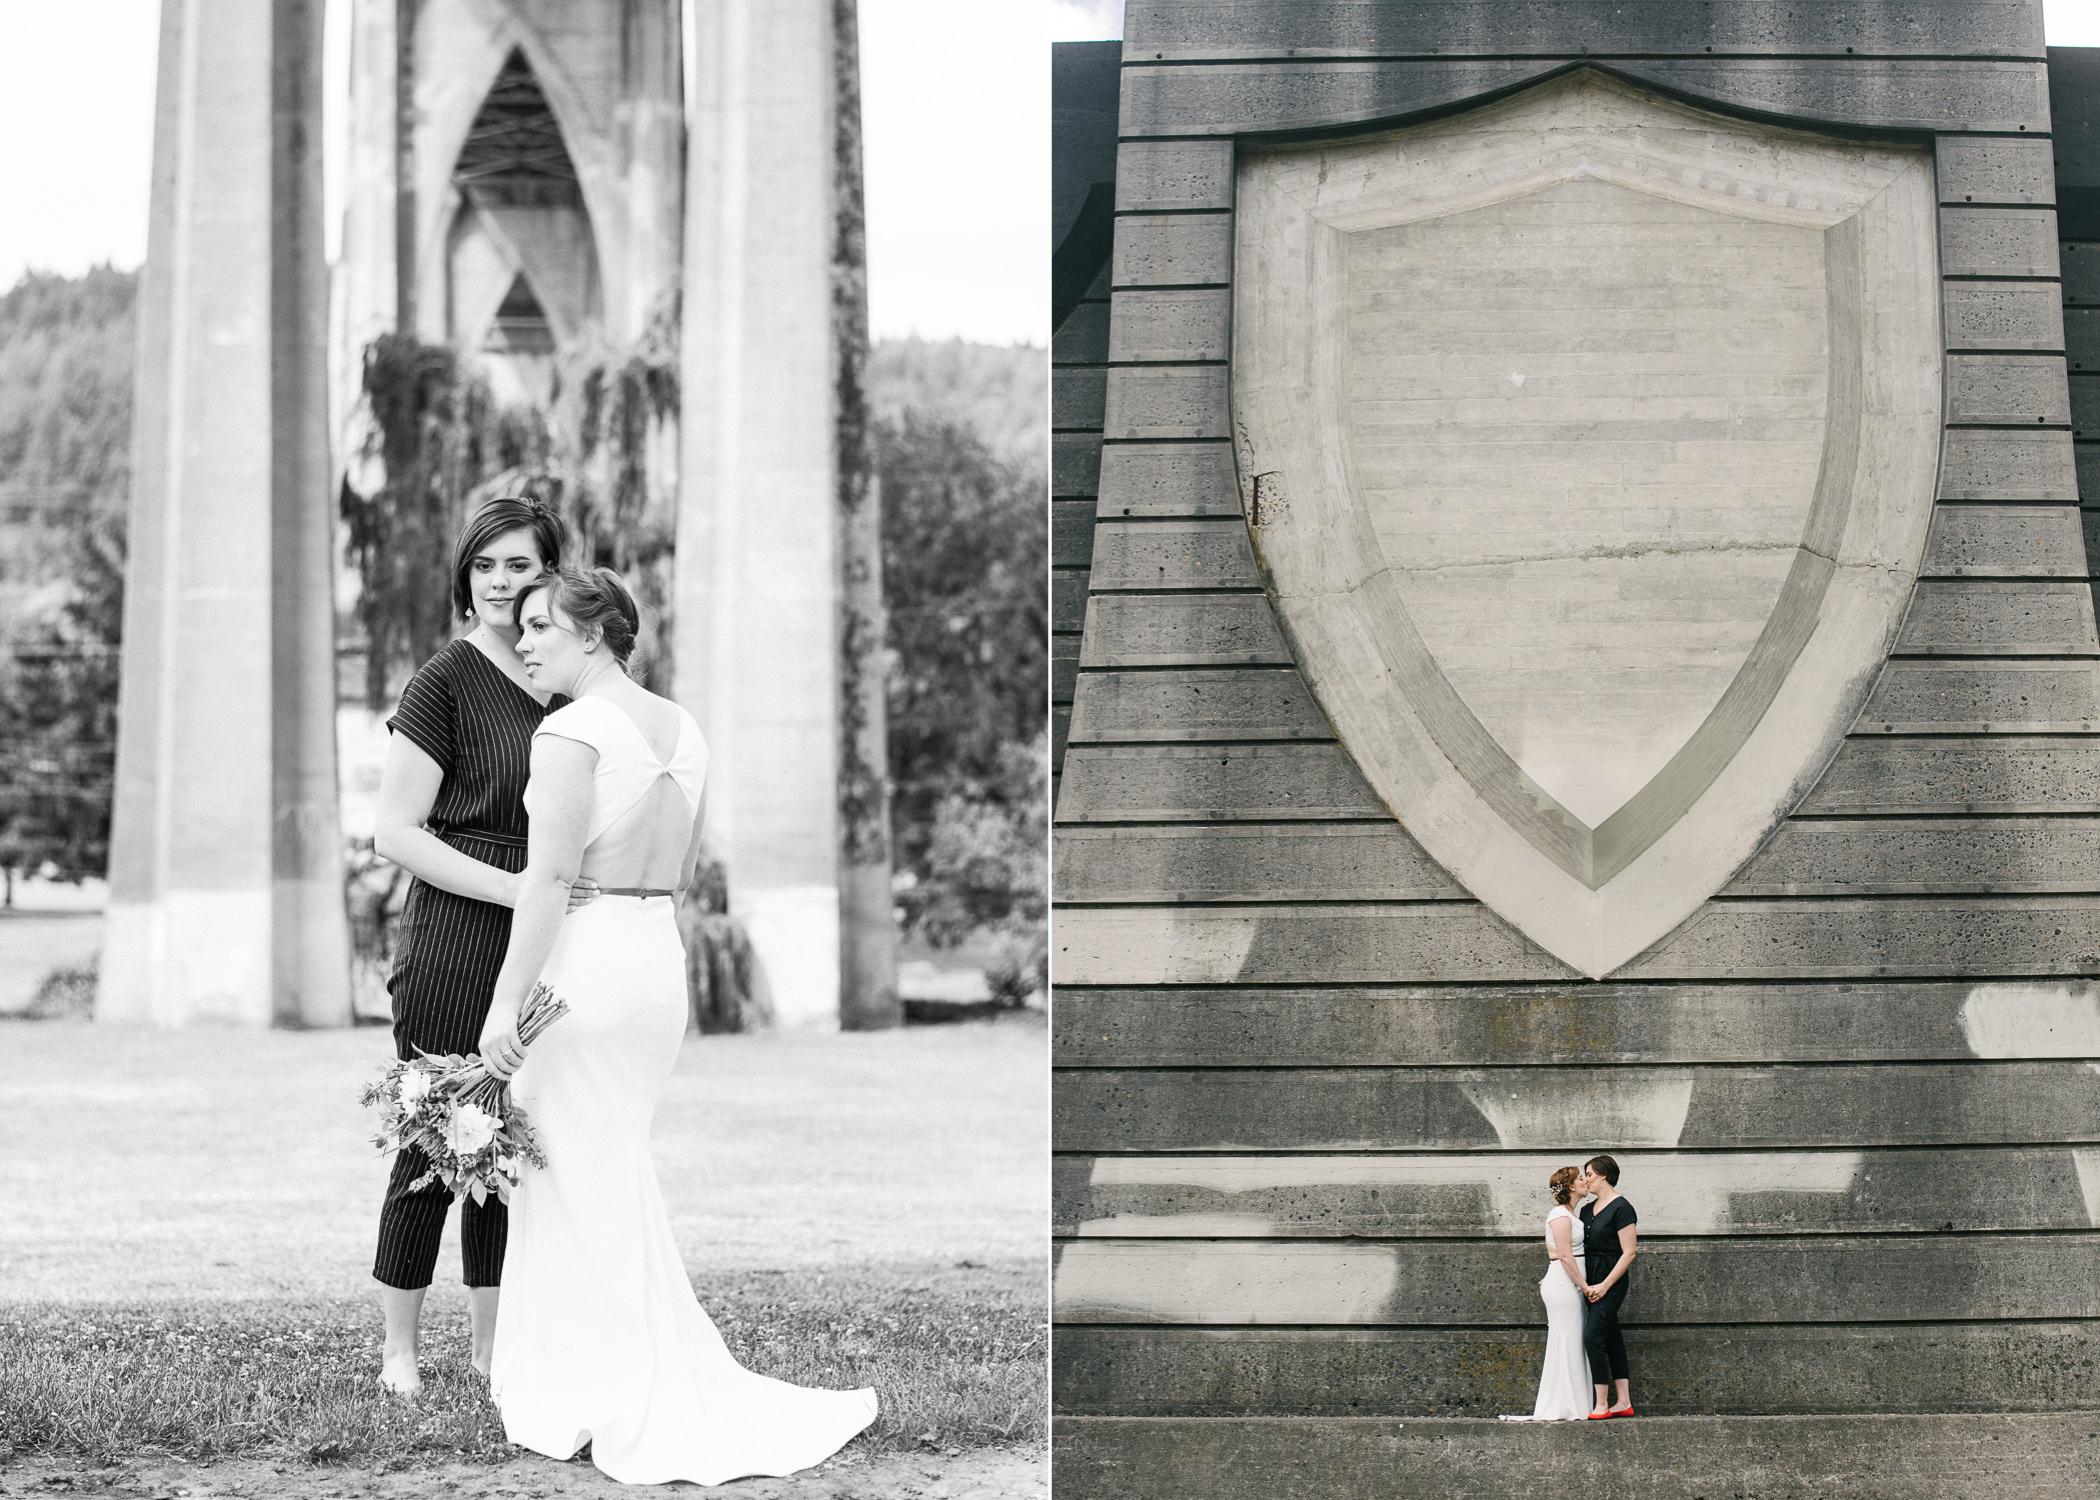 cathedral-park-portland-elopement-gay-wedding-048.JPG